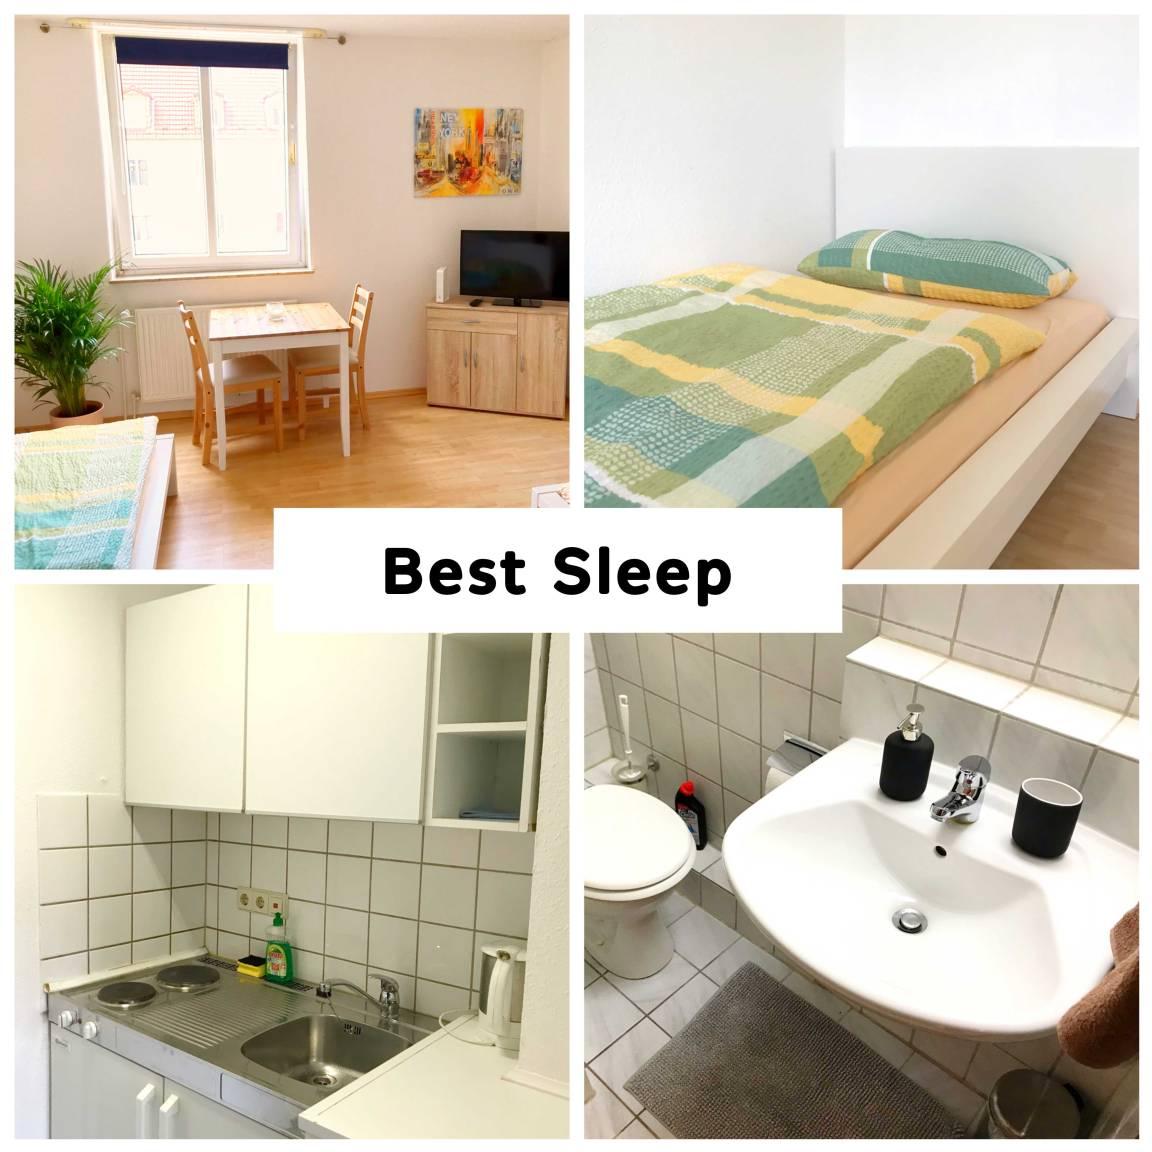 Bielefeld: Appartement Best Sleep Bielefeld